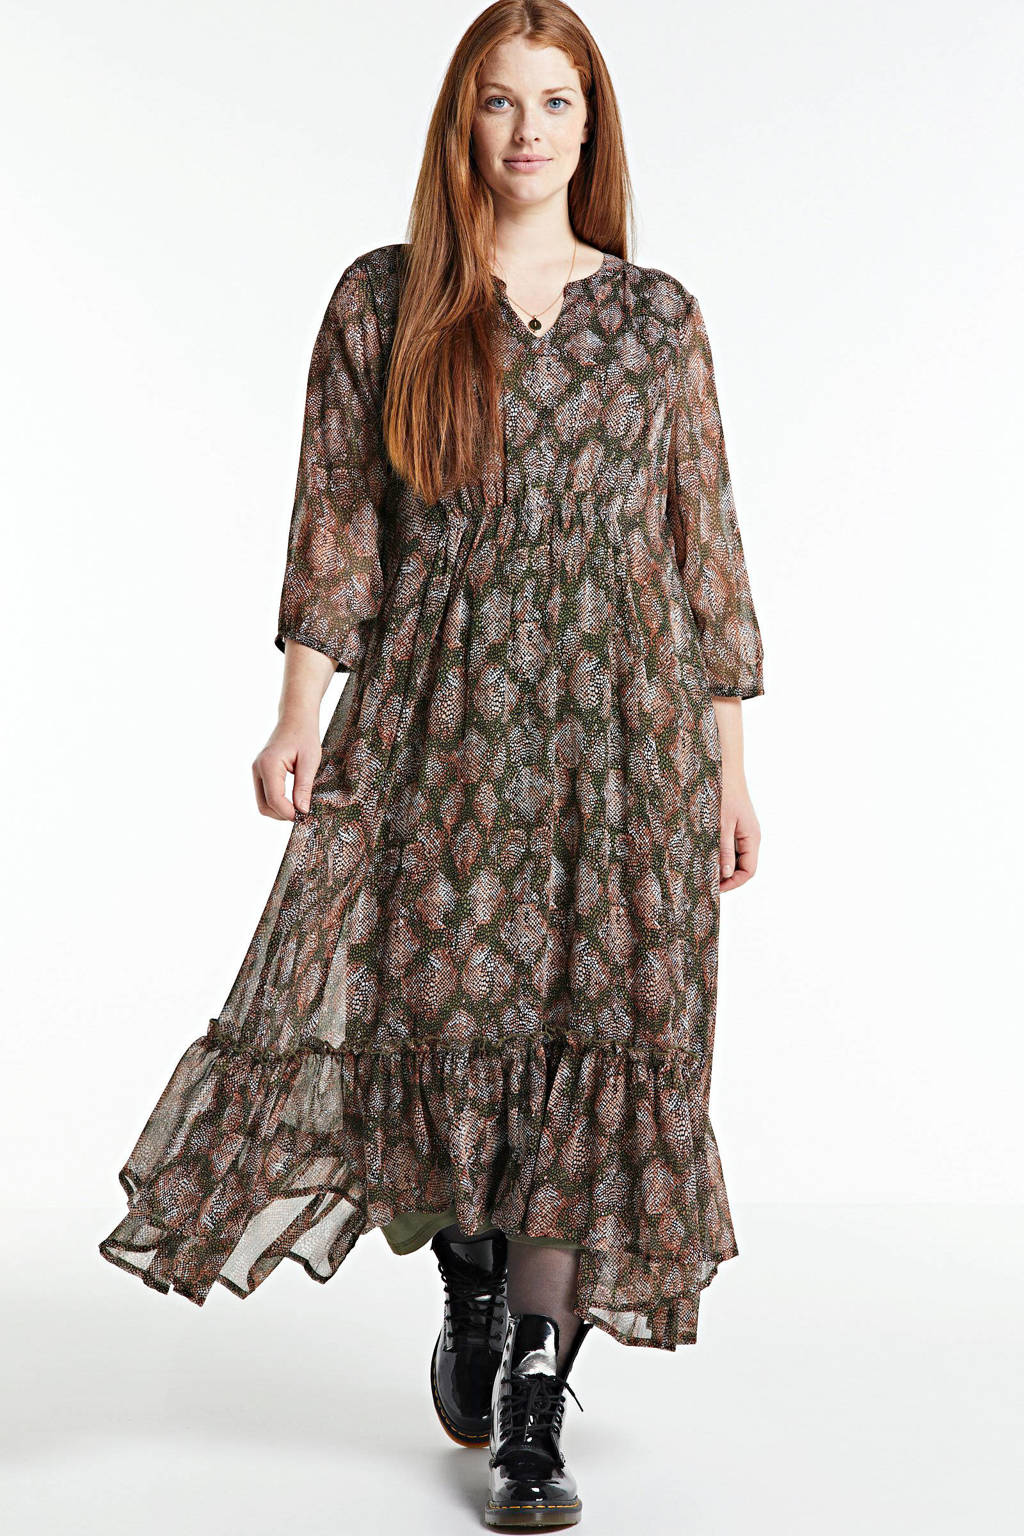 Zhenzi semi-transparante jurk TAKA 587, bruin/rood/wit